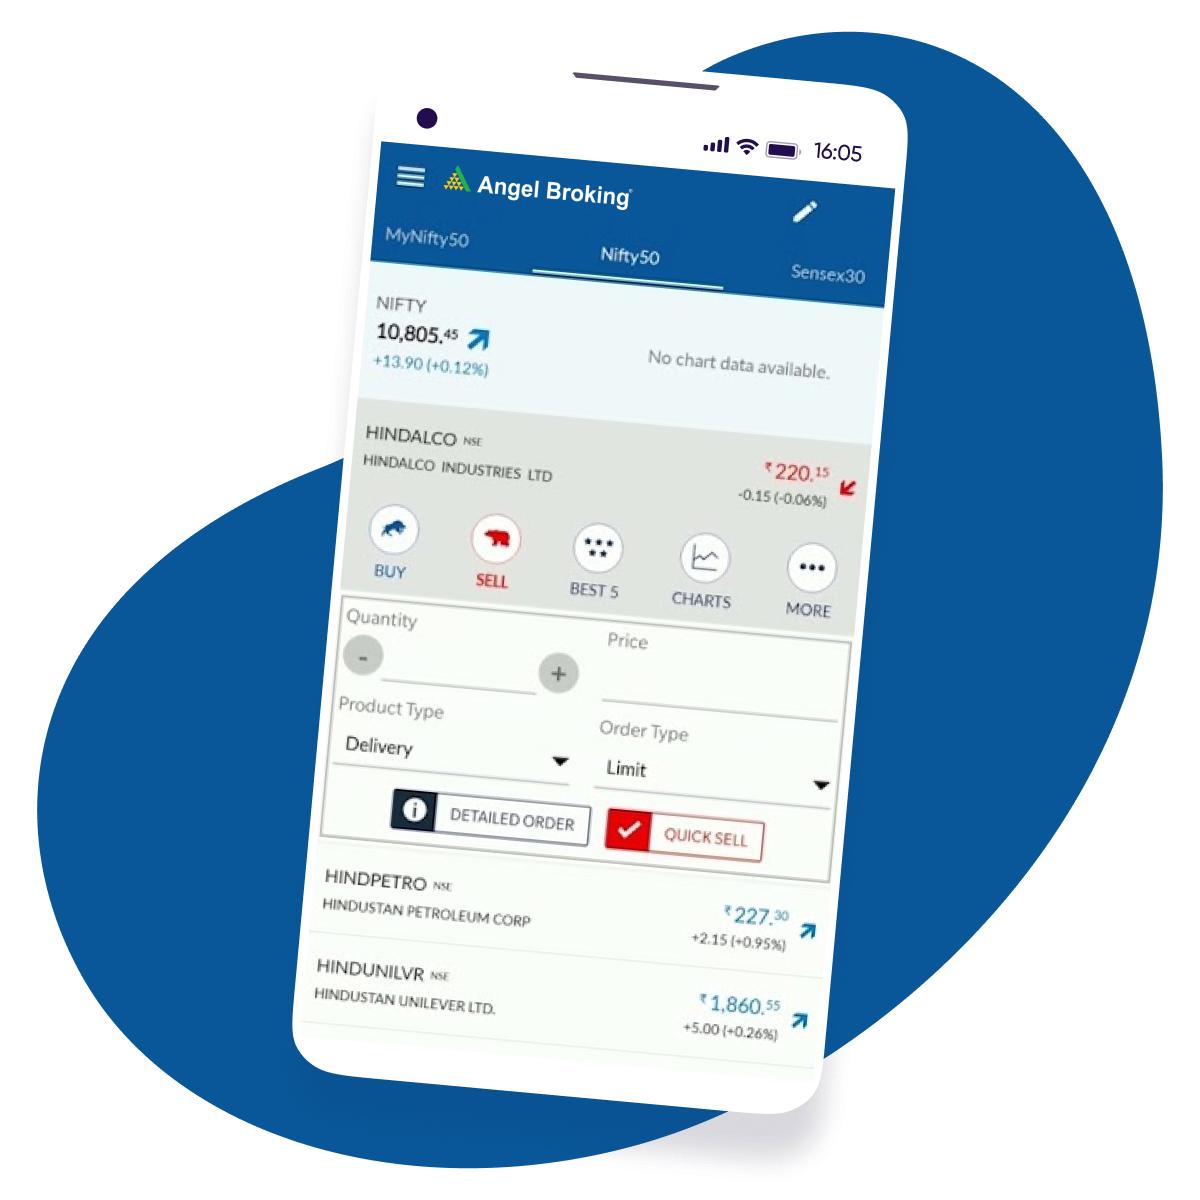 Angel Broking AppsFlyer Customer